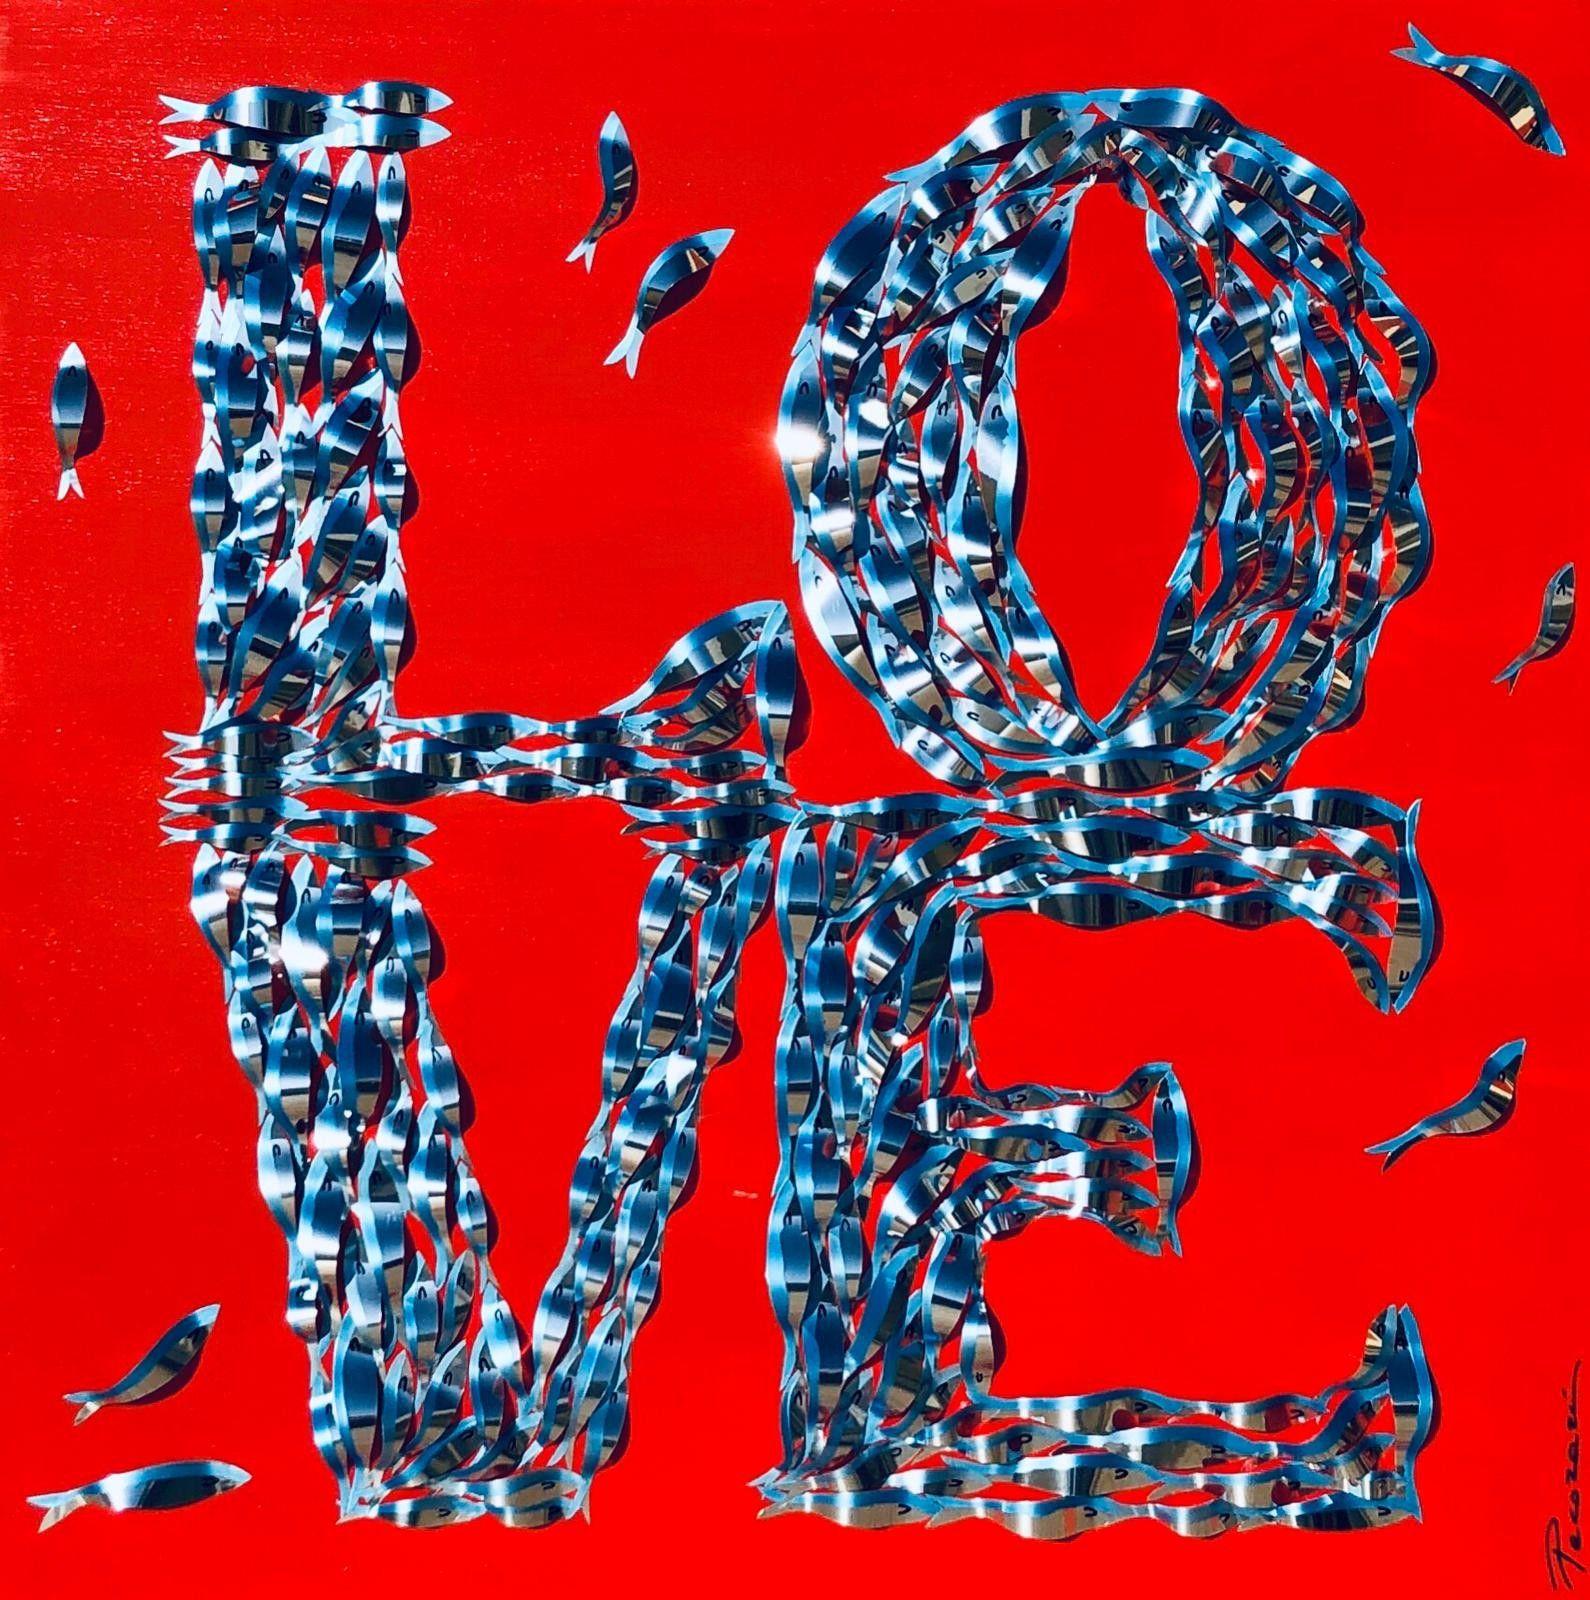 "MIXED MEDIA BARBARA PECORARI "" SARDINES LEAPING OUT POP LOVE ""  dimensioni  L 100 x H 100 cm."